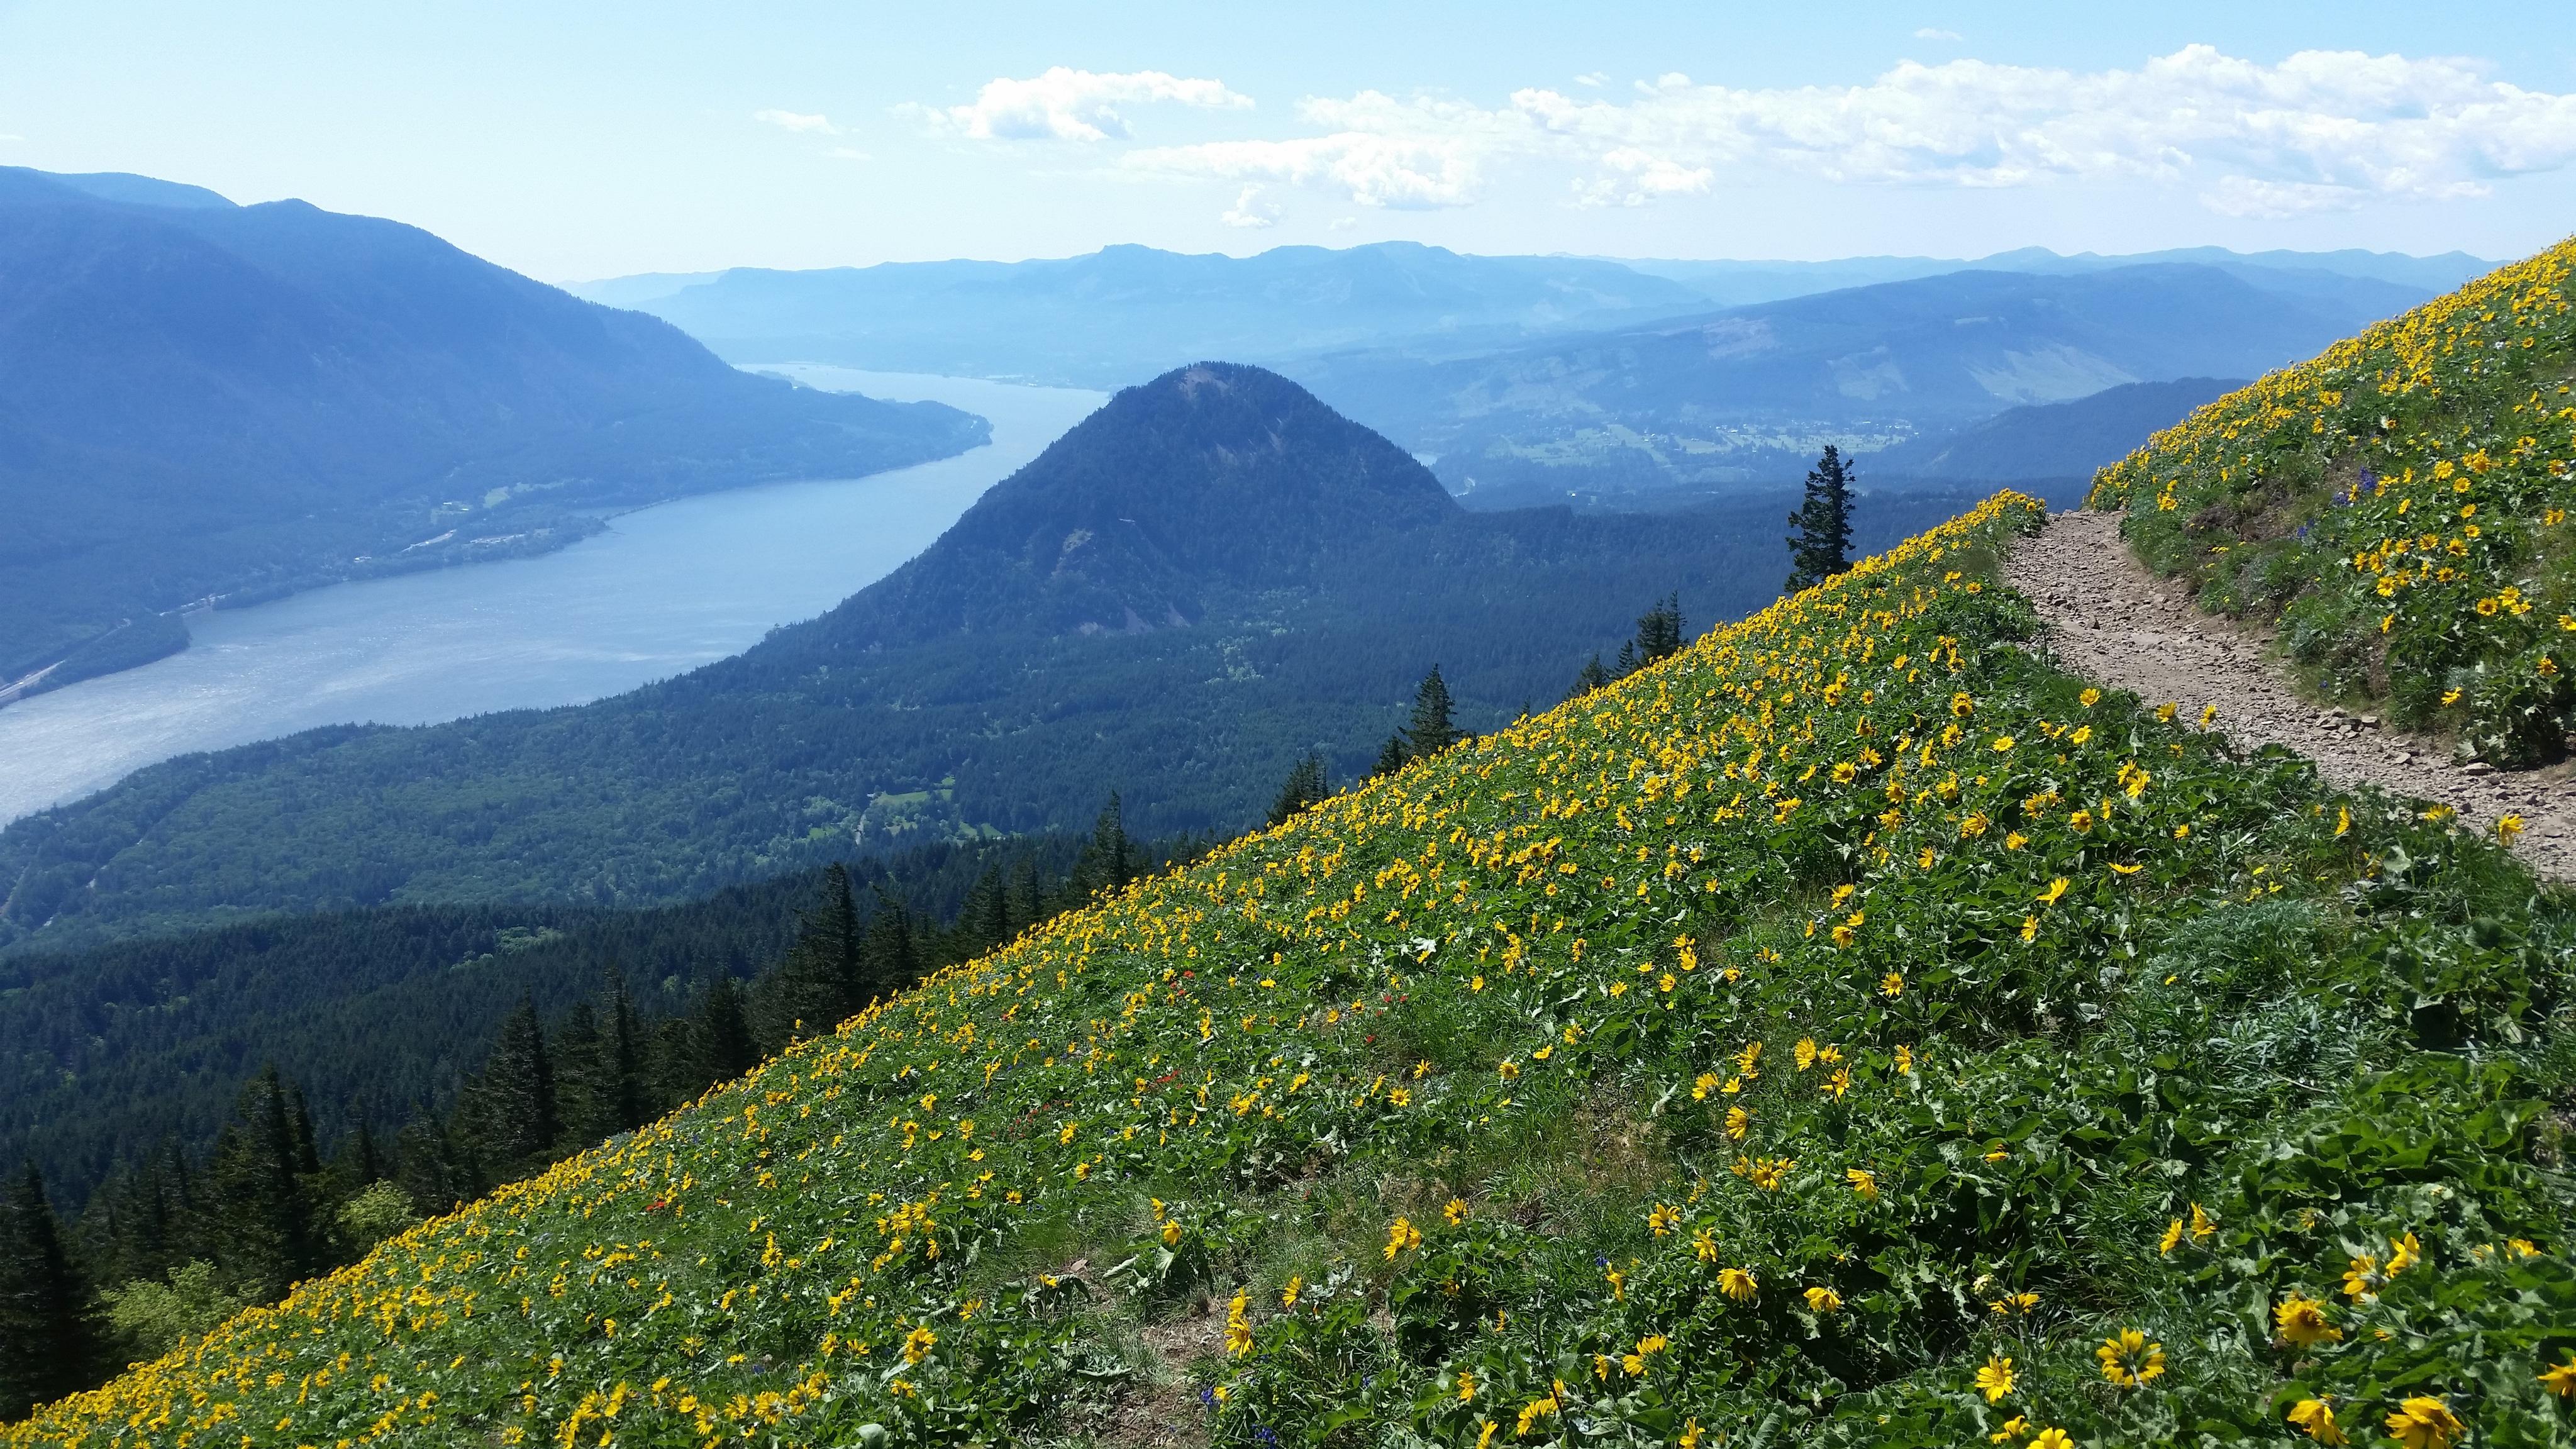 Hiking Dog Mountain